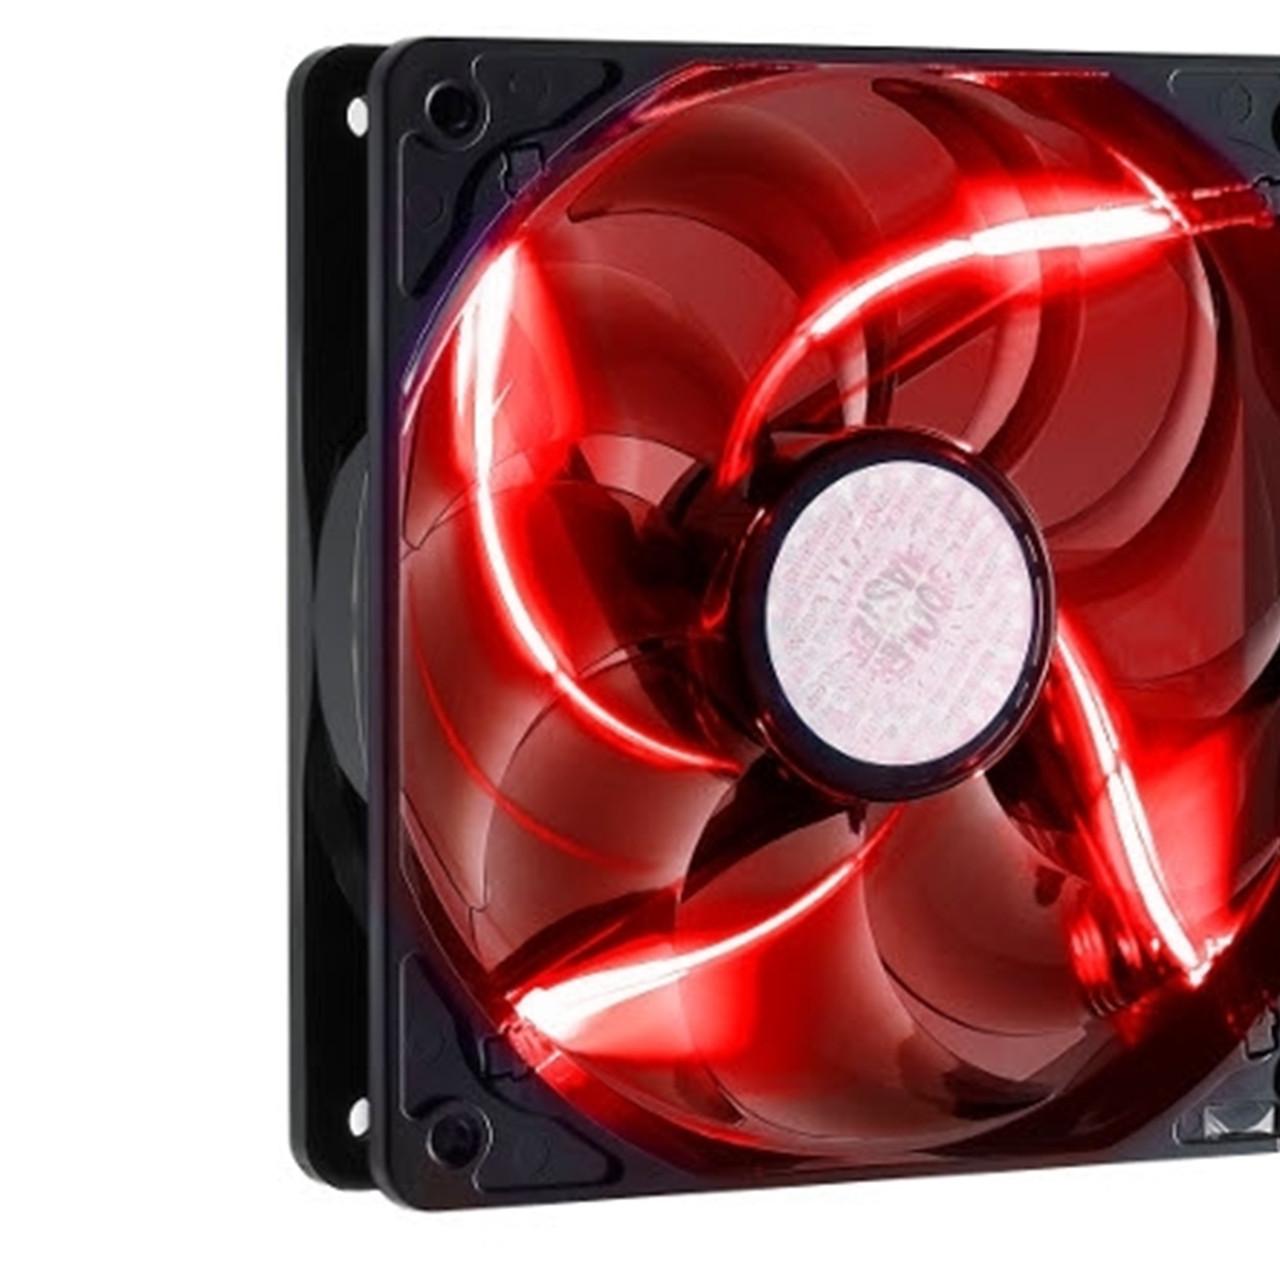 Вентилятор для корпуса CoolerMaster SickleFlow 120 Red LED (R4-L2R-20AR-R1)